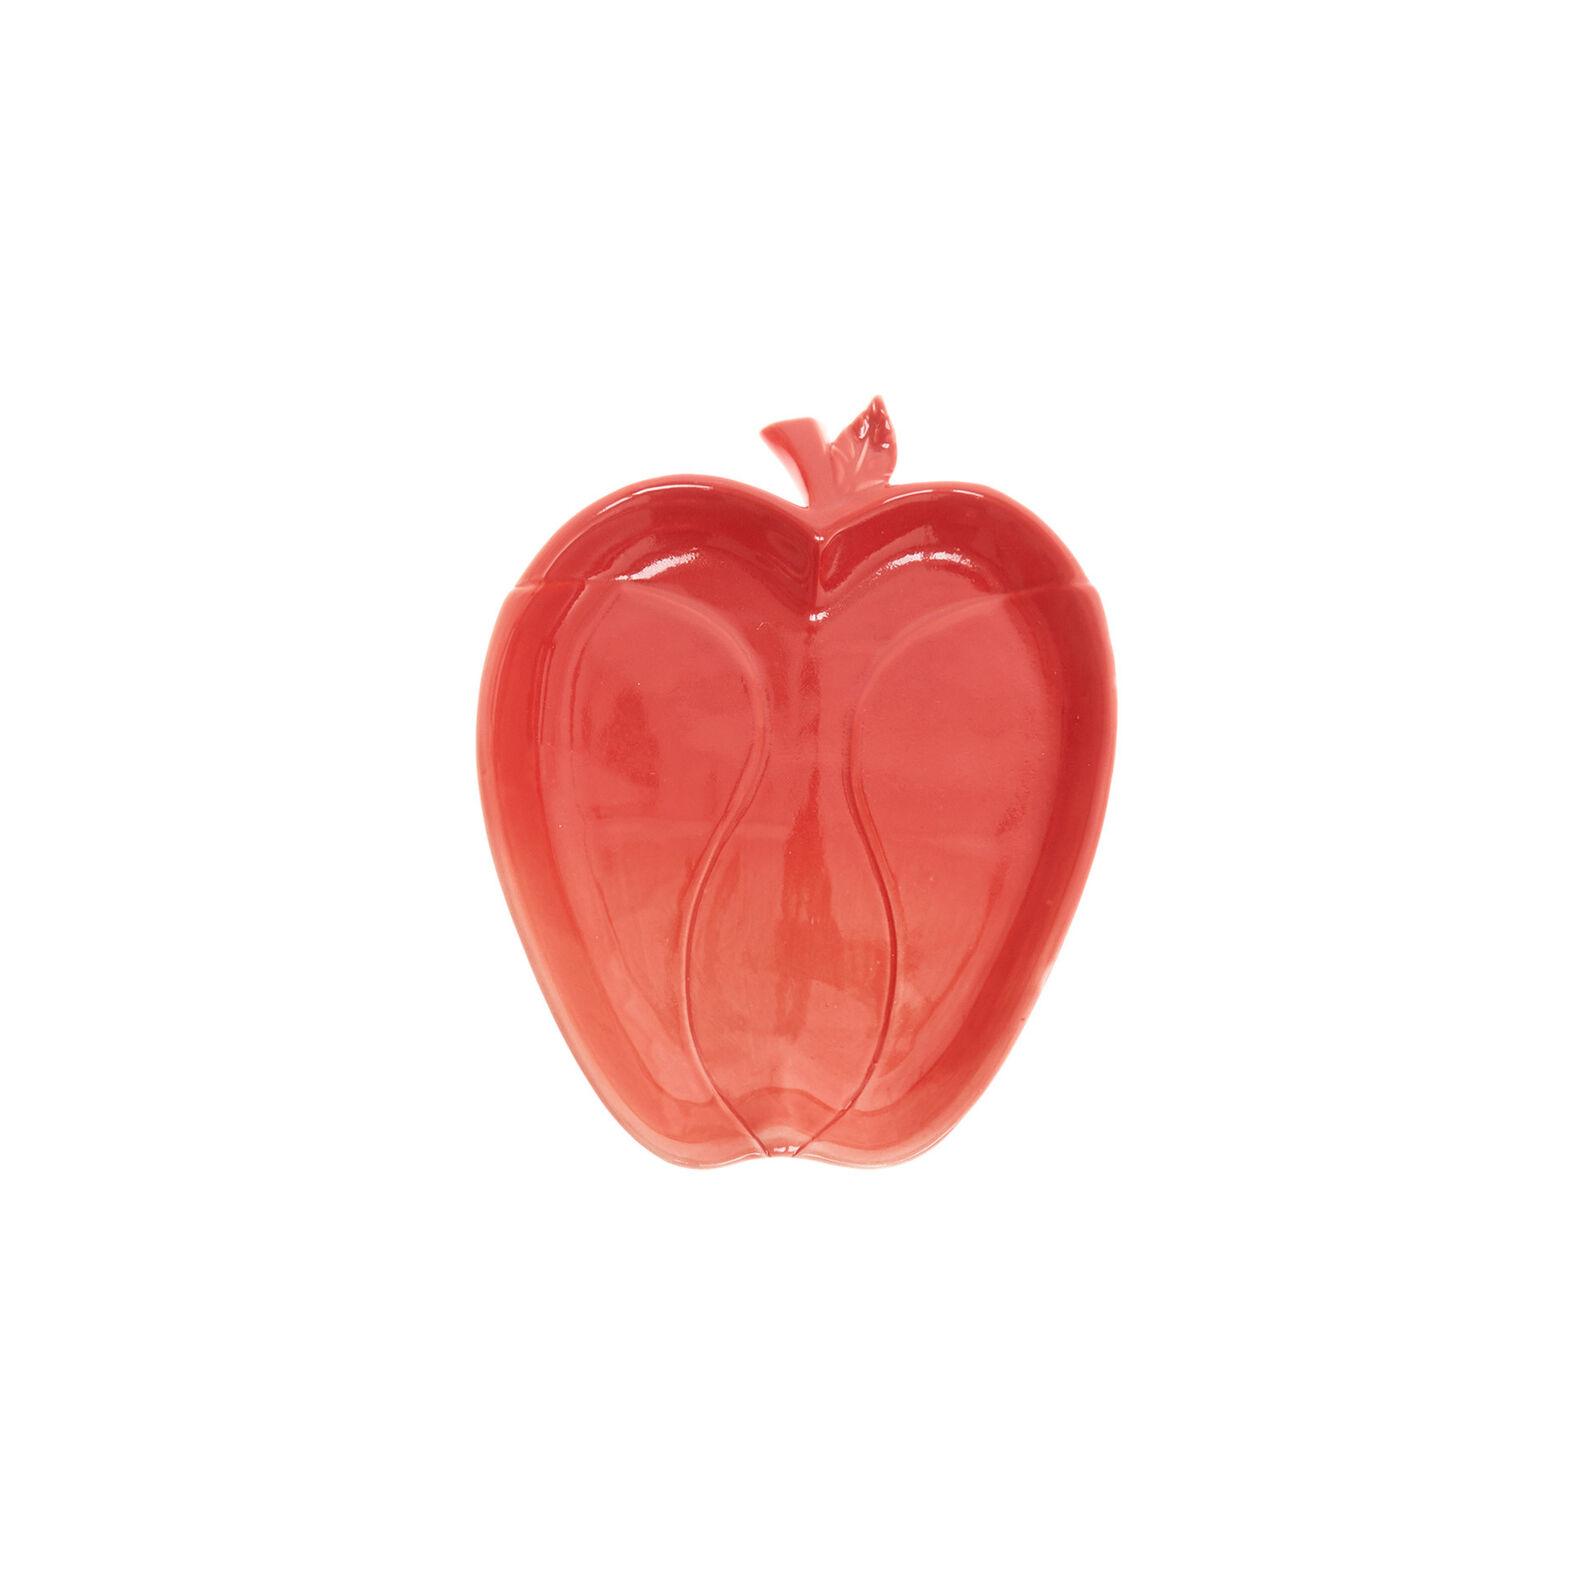 Piatto in porcellana a mela